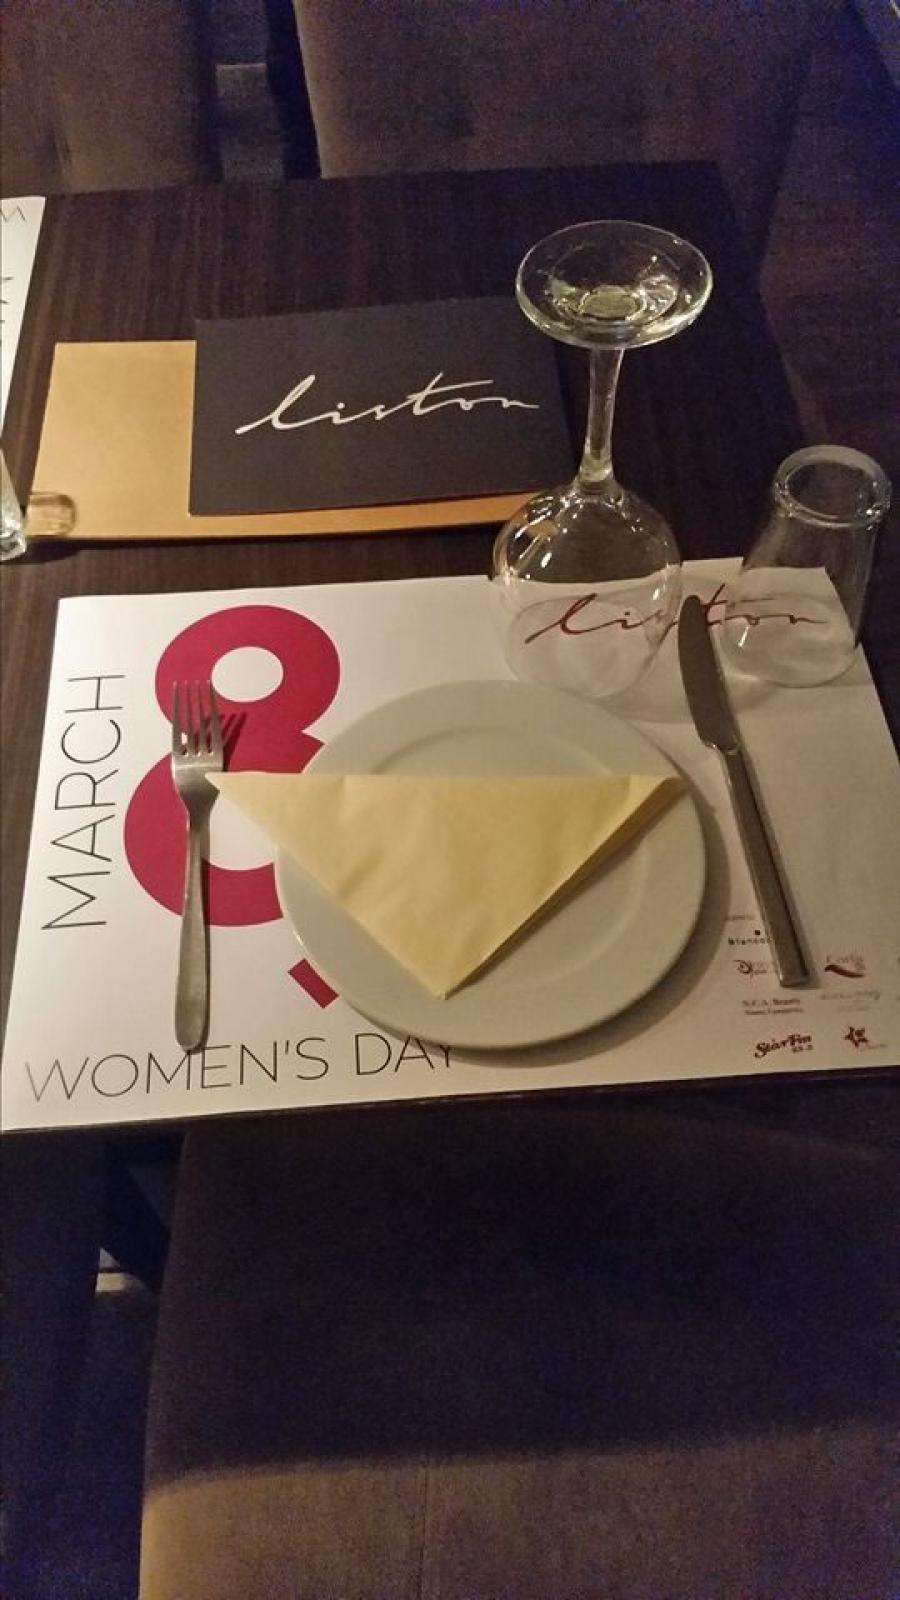 Women's day event identity